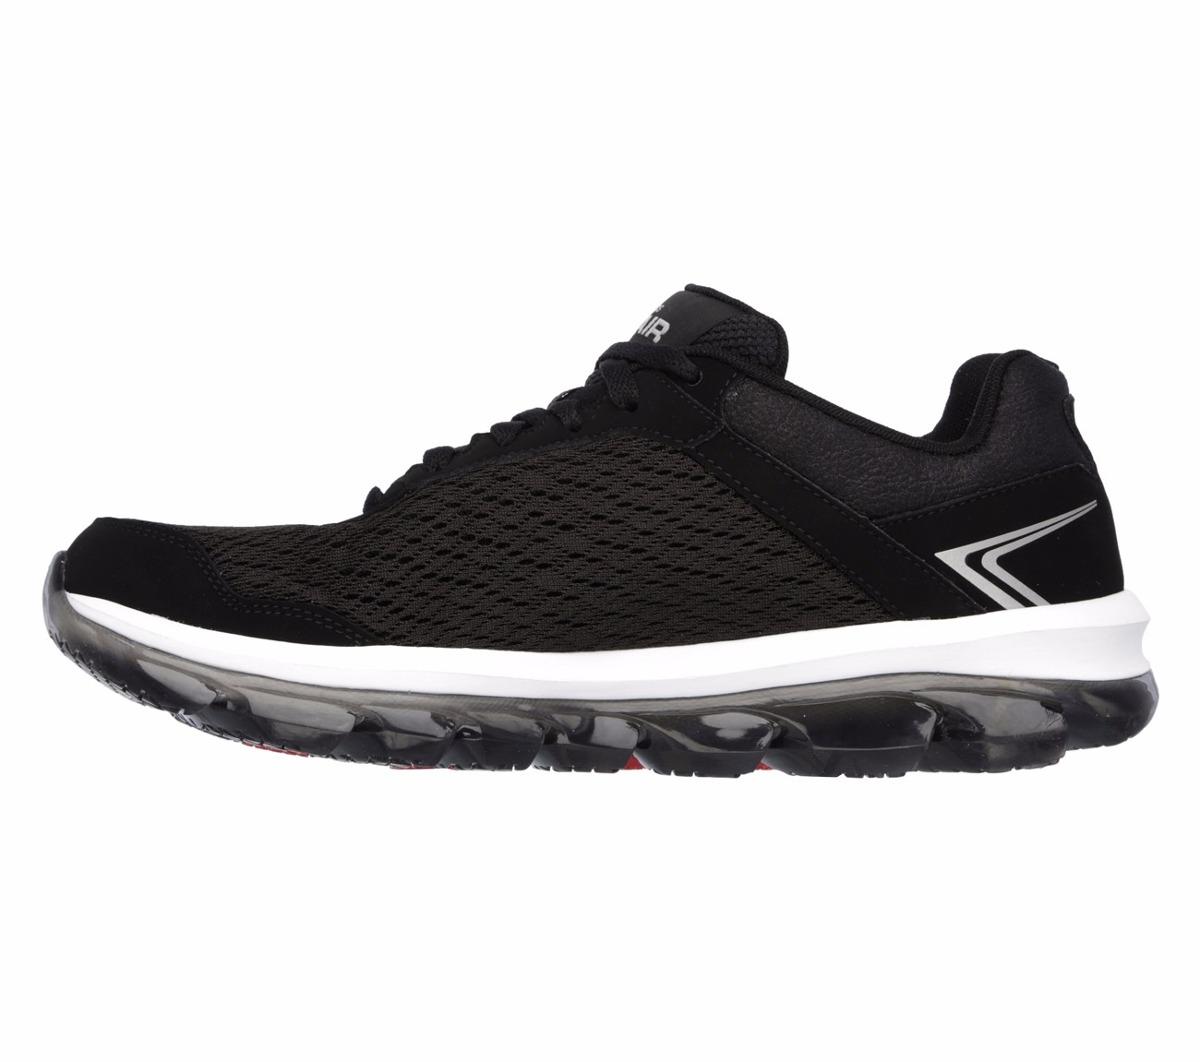 Zapatos 3 Goga Hombre Skechers 54230 Bs 50 En Mat Bkw Para rBTAnB